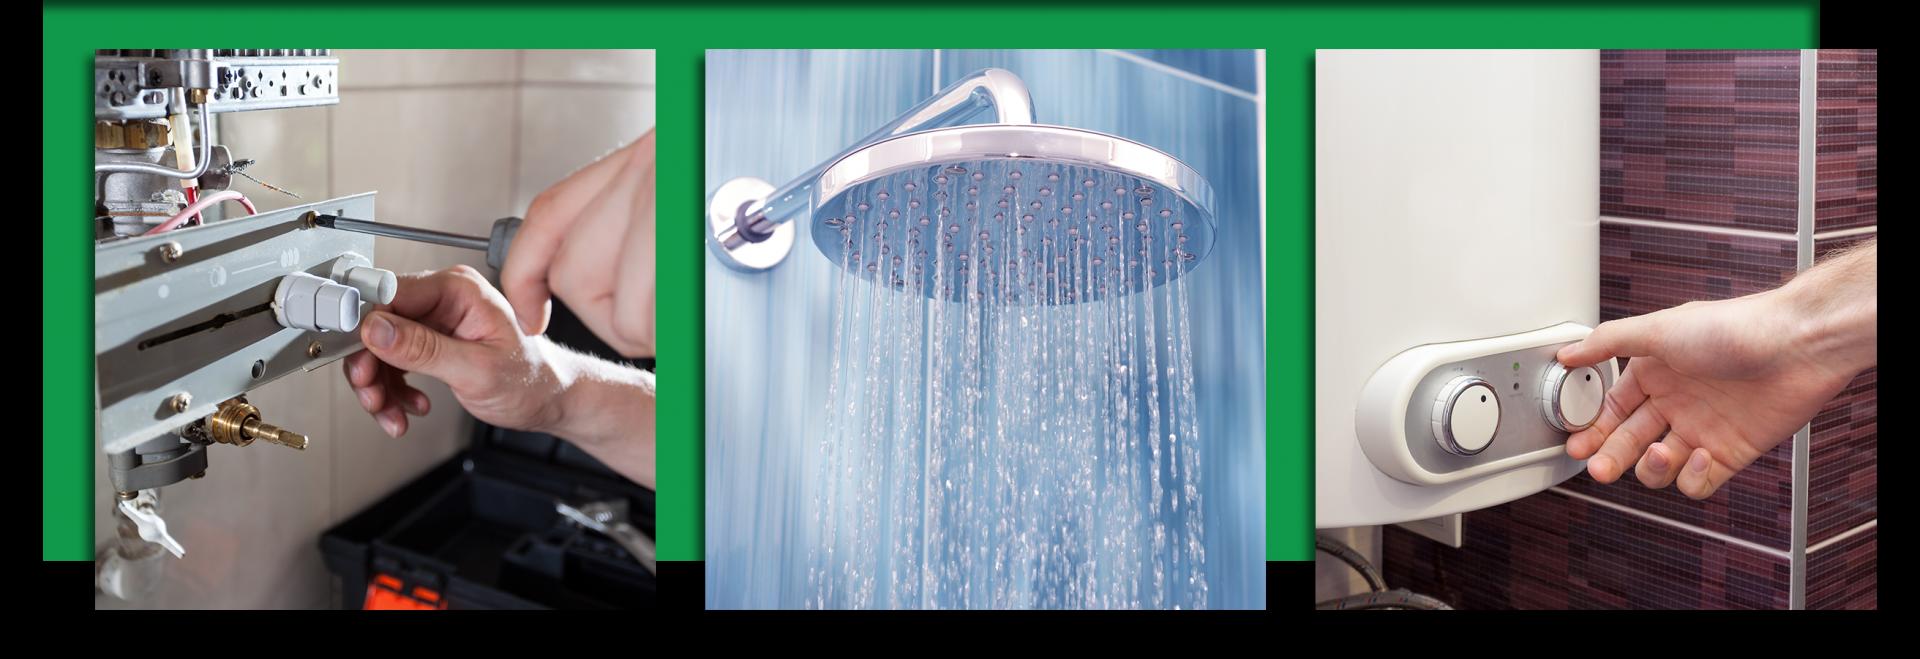 fixing water heater shower